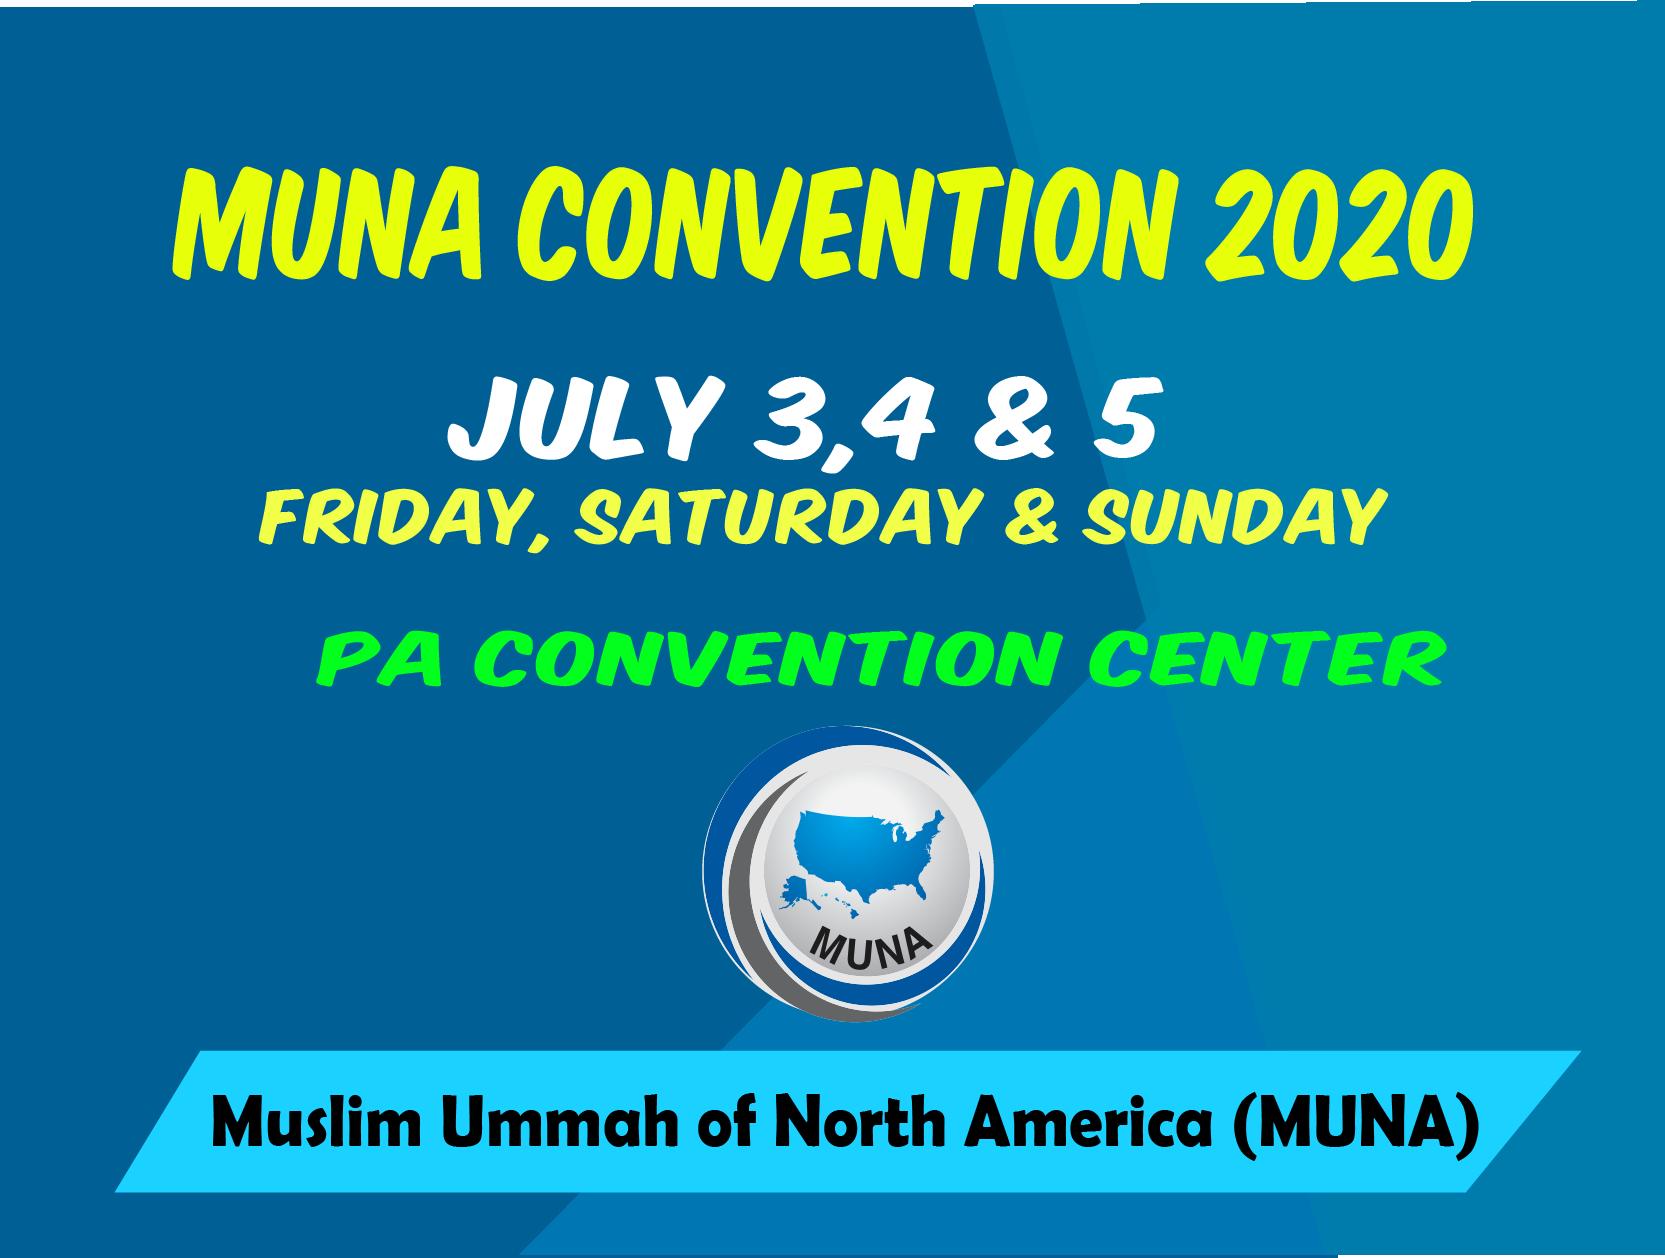 MUNA Convention 2020